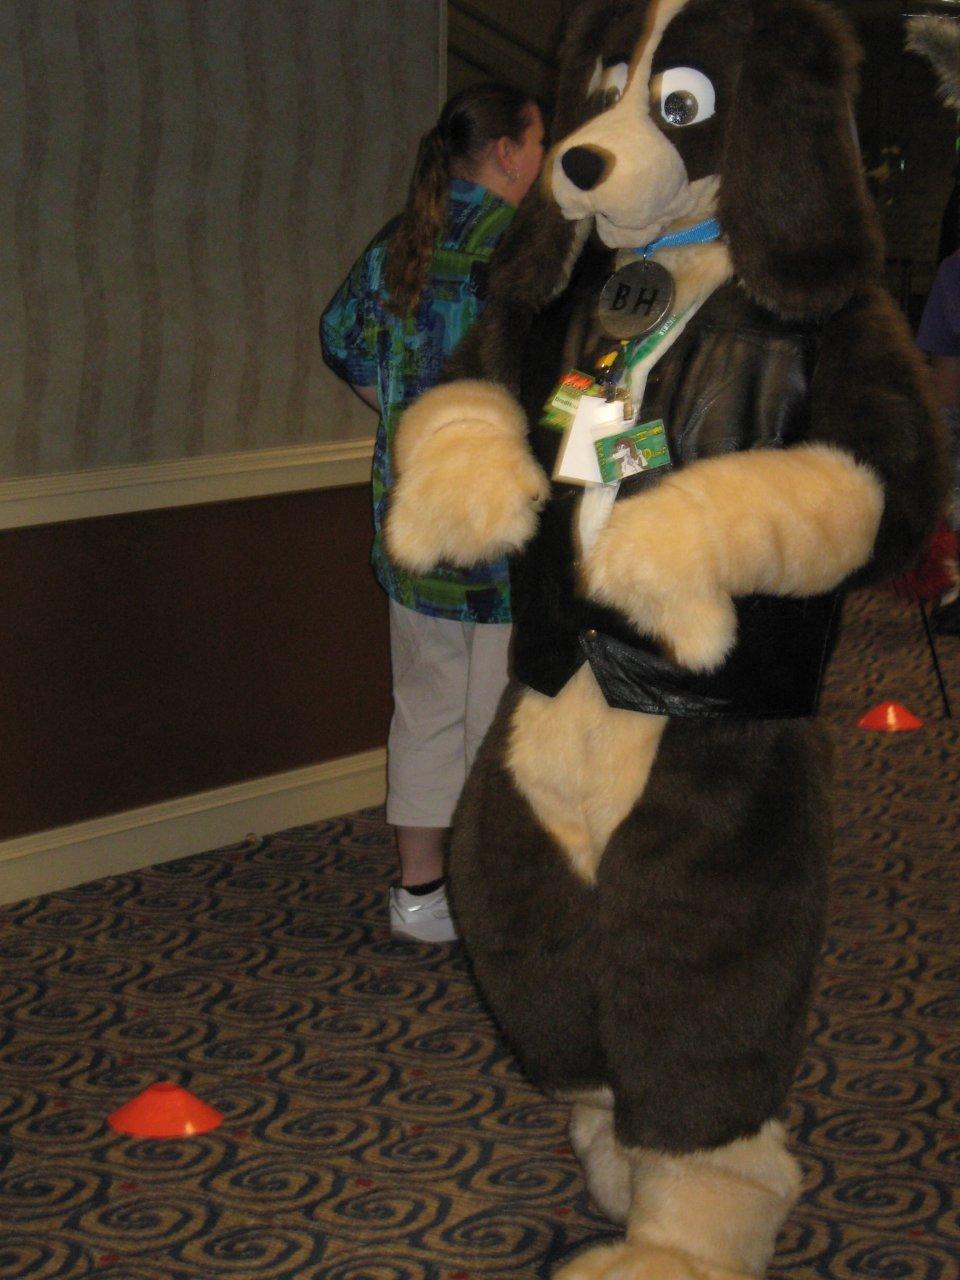 FWA 2012 - Day 2 - Fursuit Parade - Bradhound